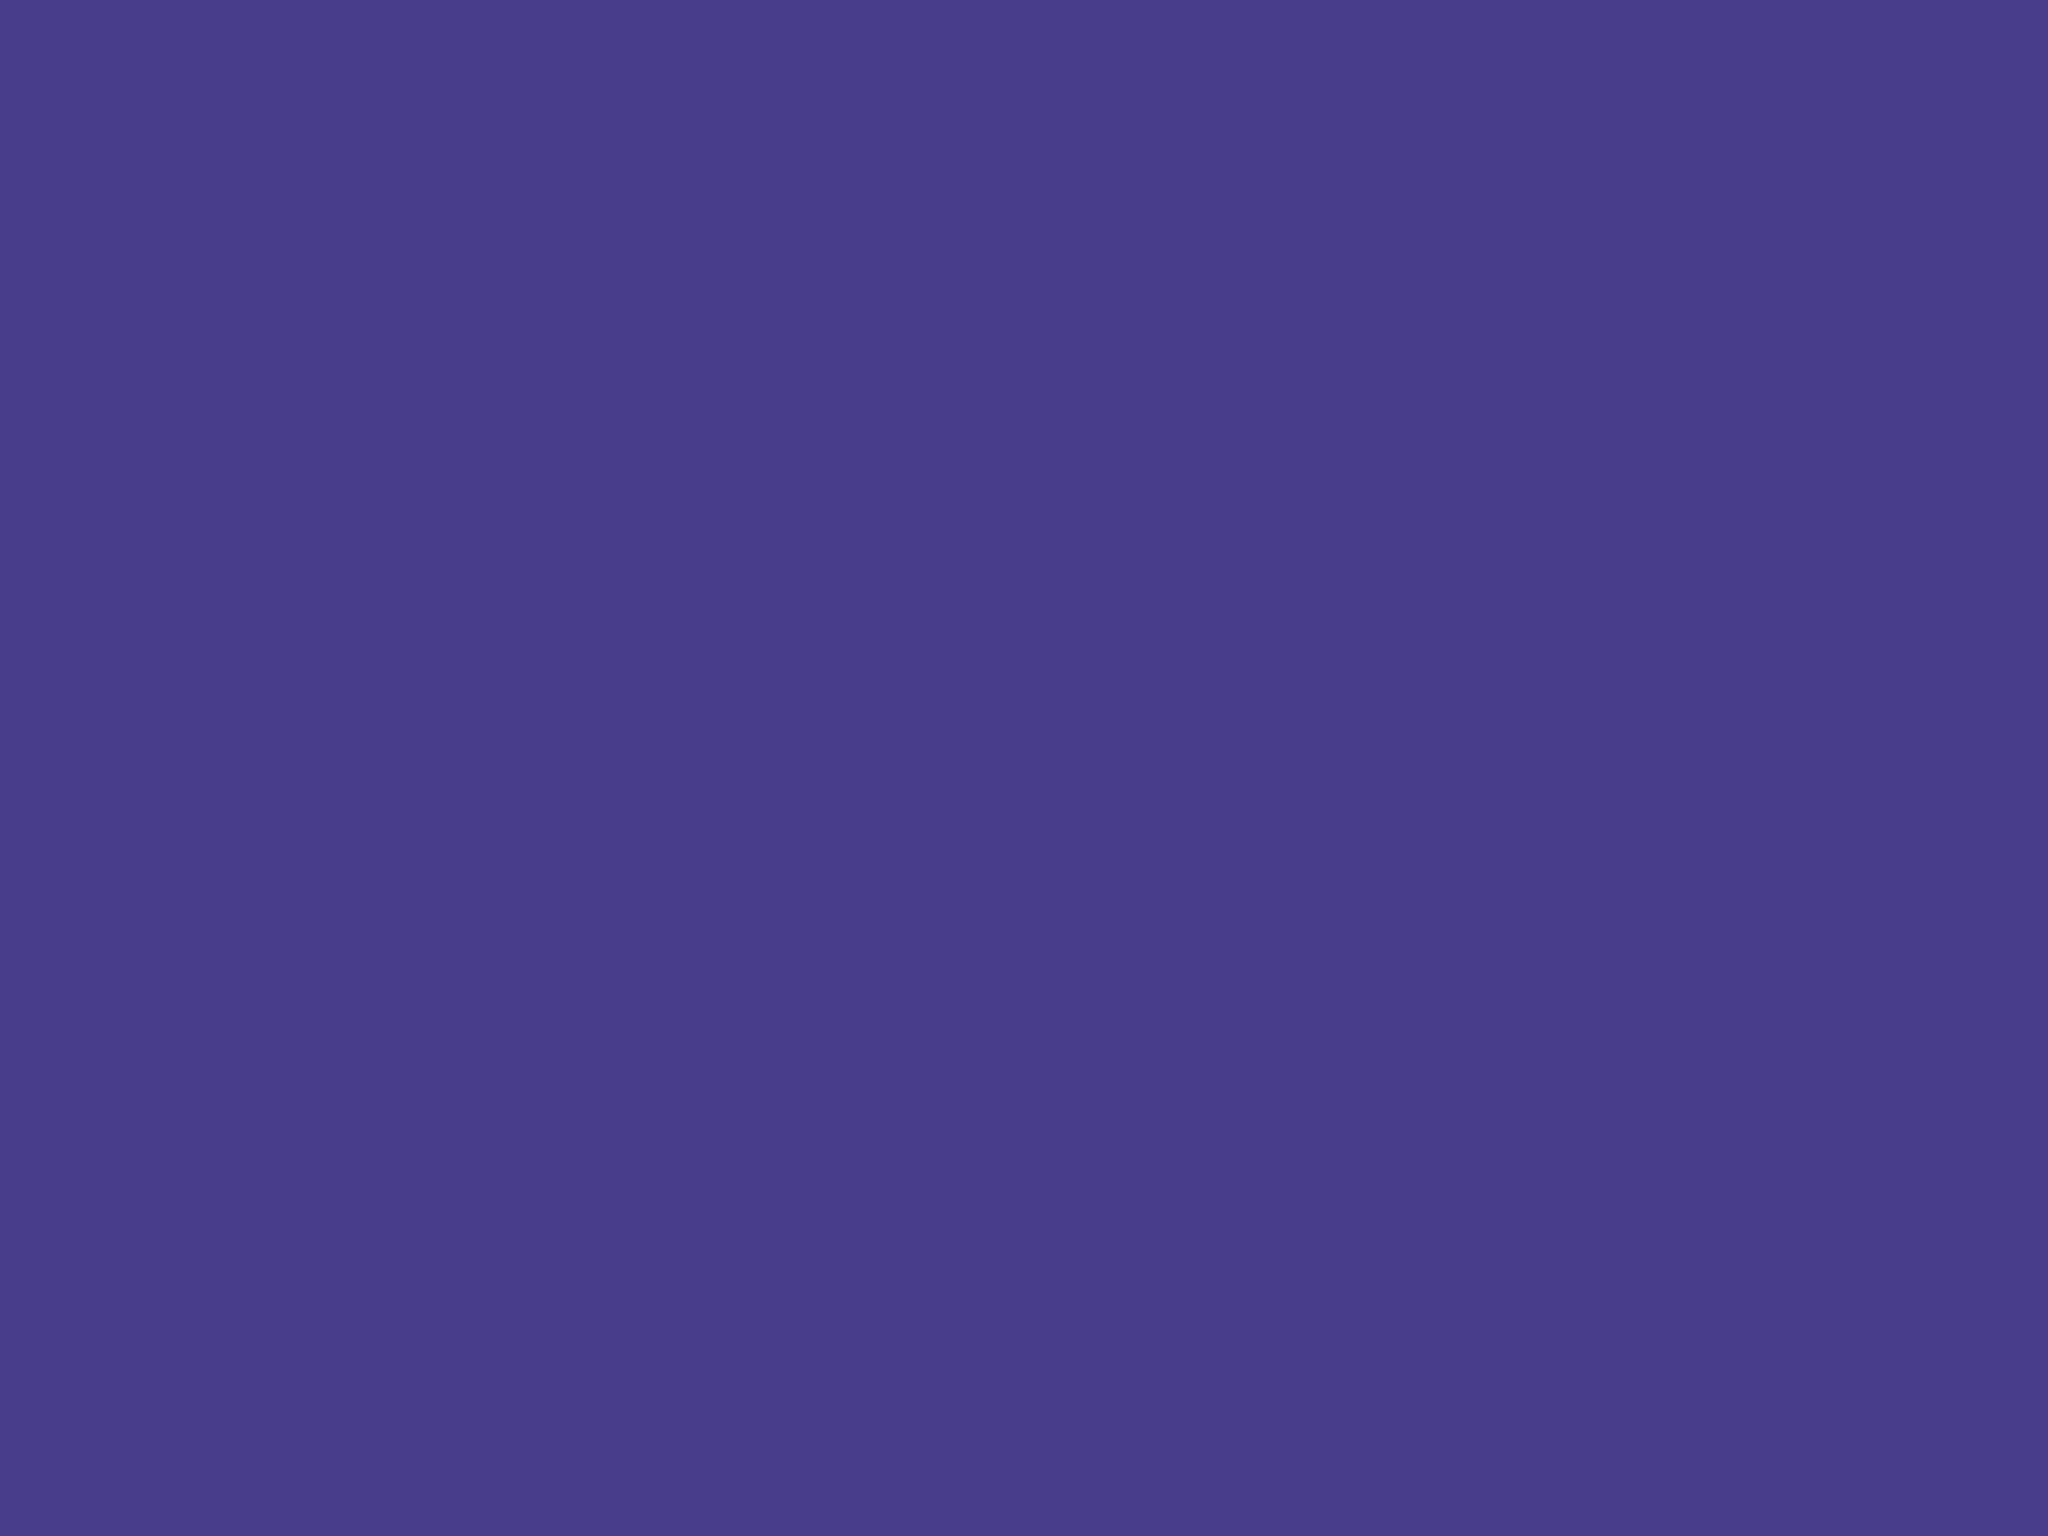 2048x1536 Dark Slate Blue Solid Color Background